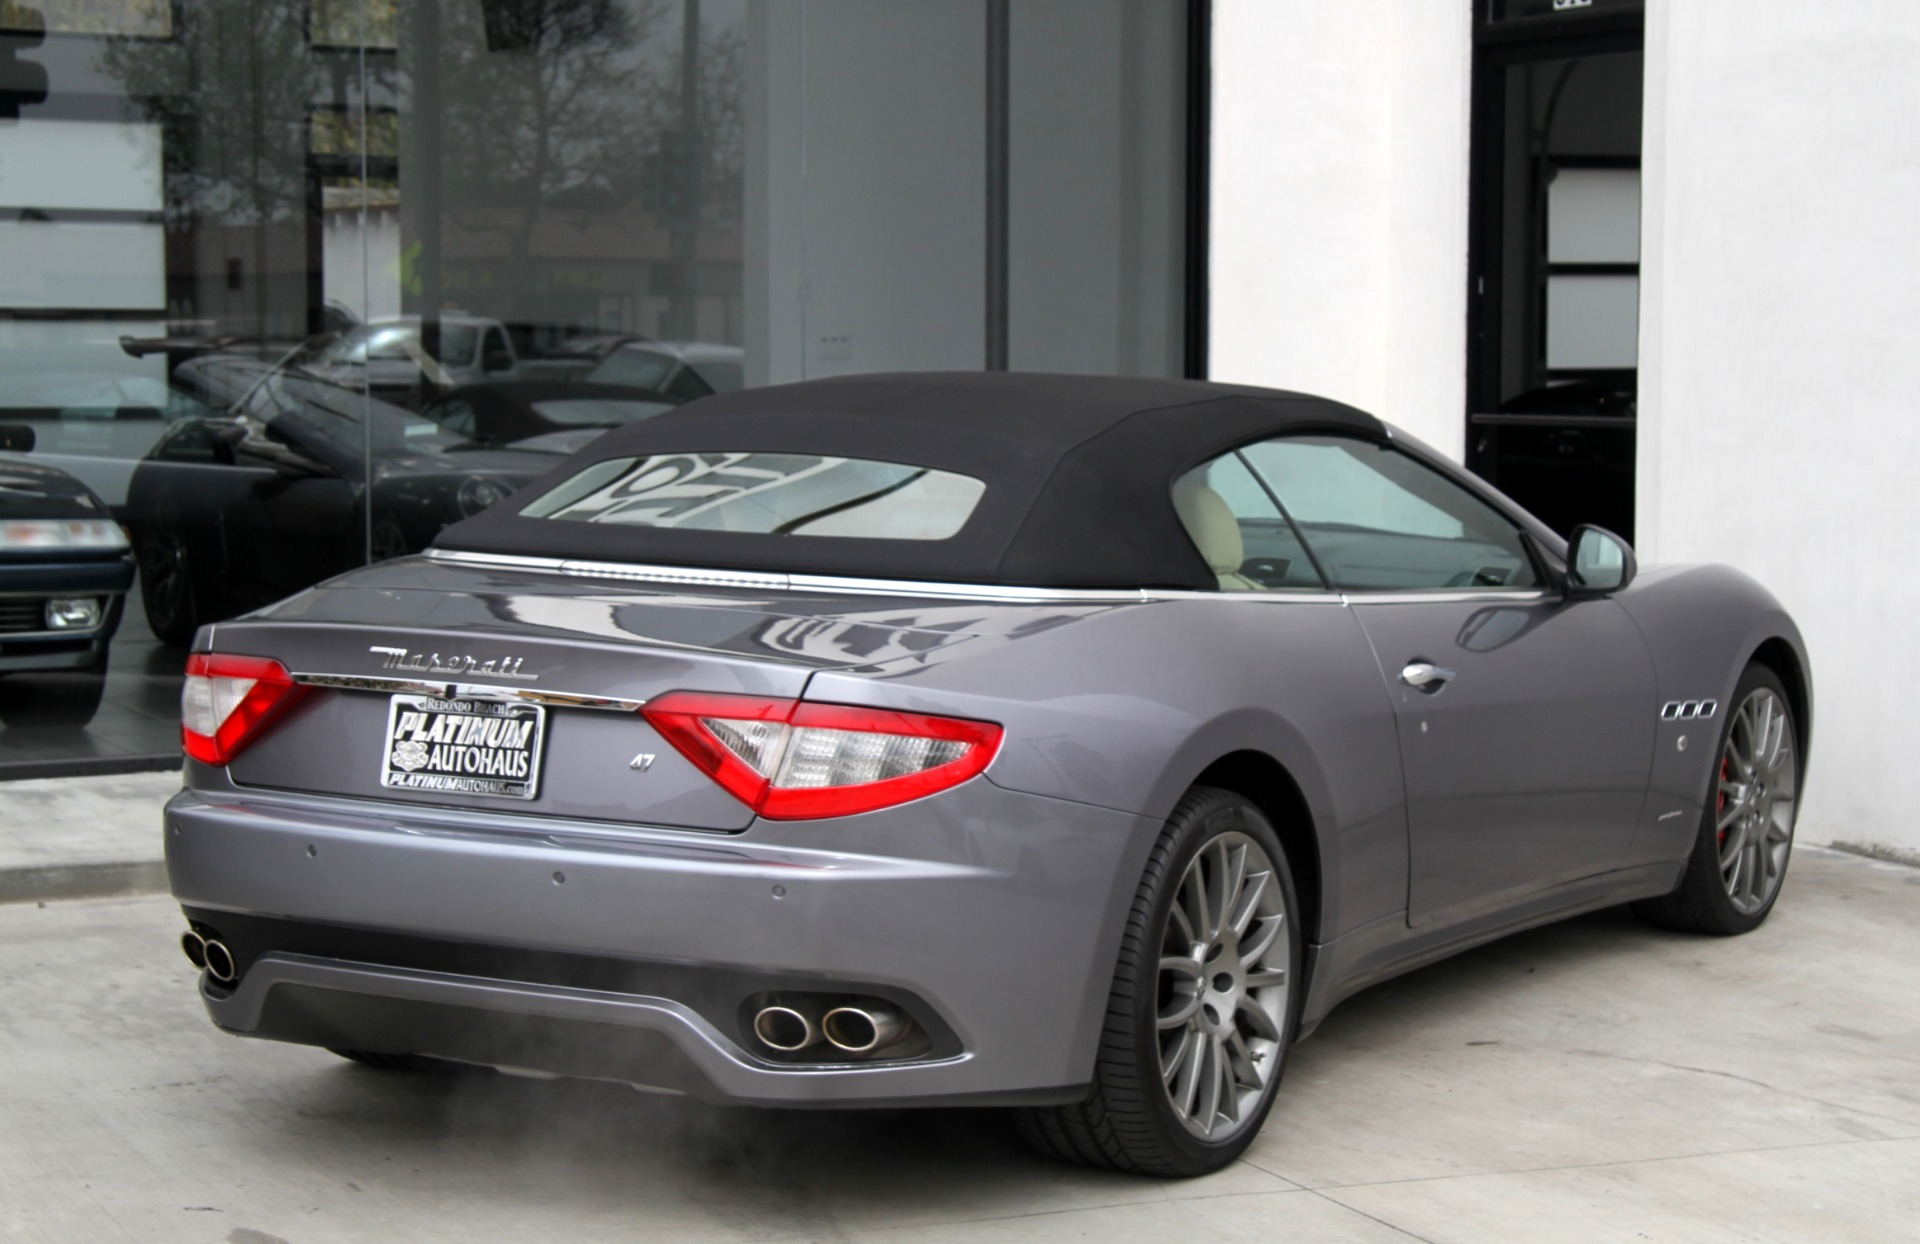 Mercury Dealer Near Me >> 2011 Maserati GranTurismo Stock # 6135A for sale near Redondo Beach, CA | CA Maserati Dealer